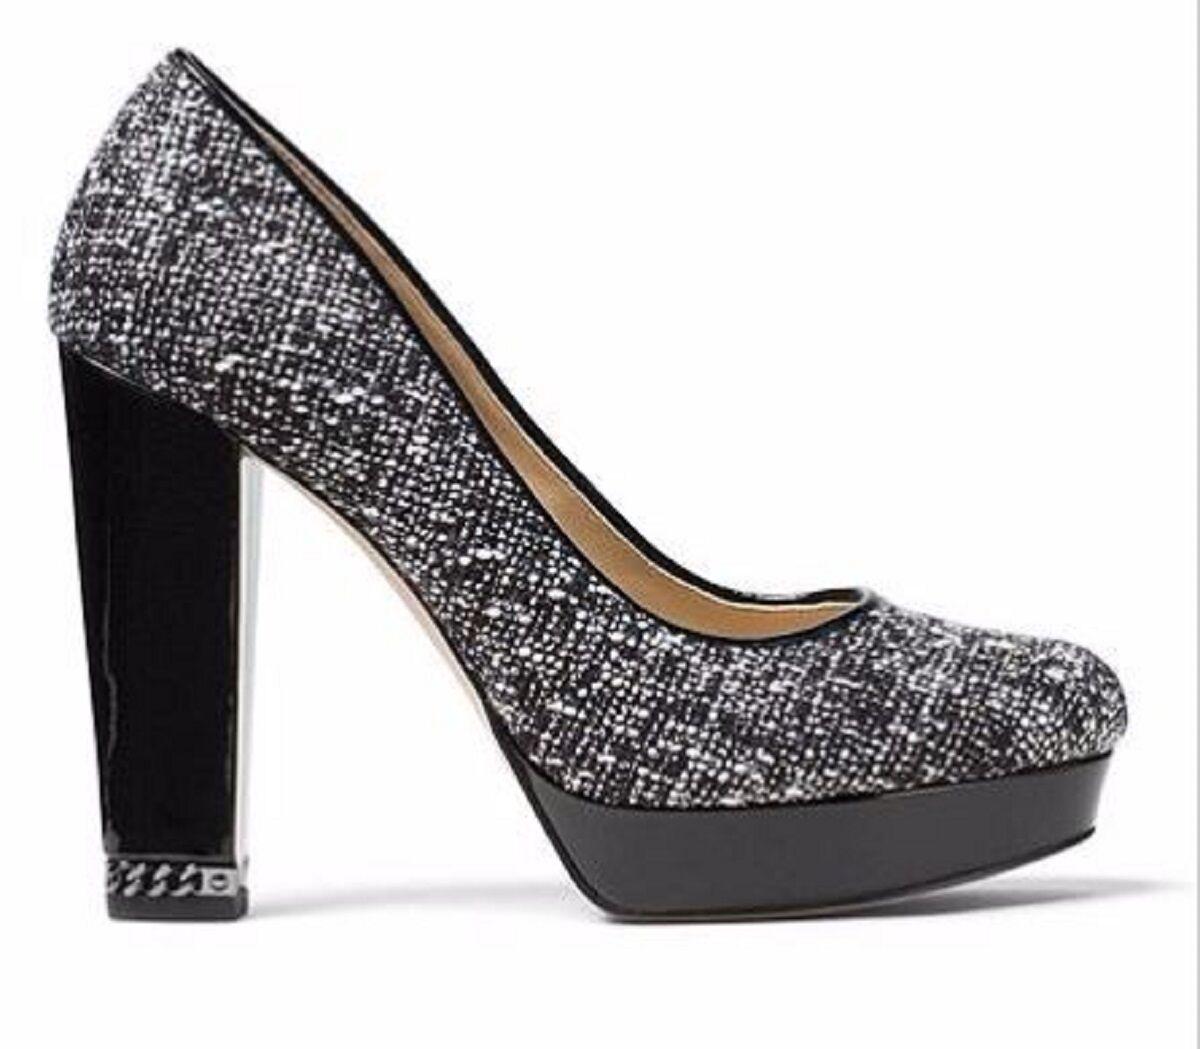 Women's Shoes Michael Kors SABRINA PUMP TWEED Platform Heels Black White